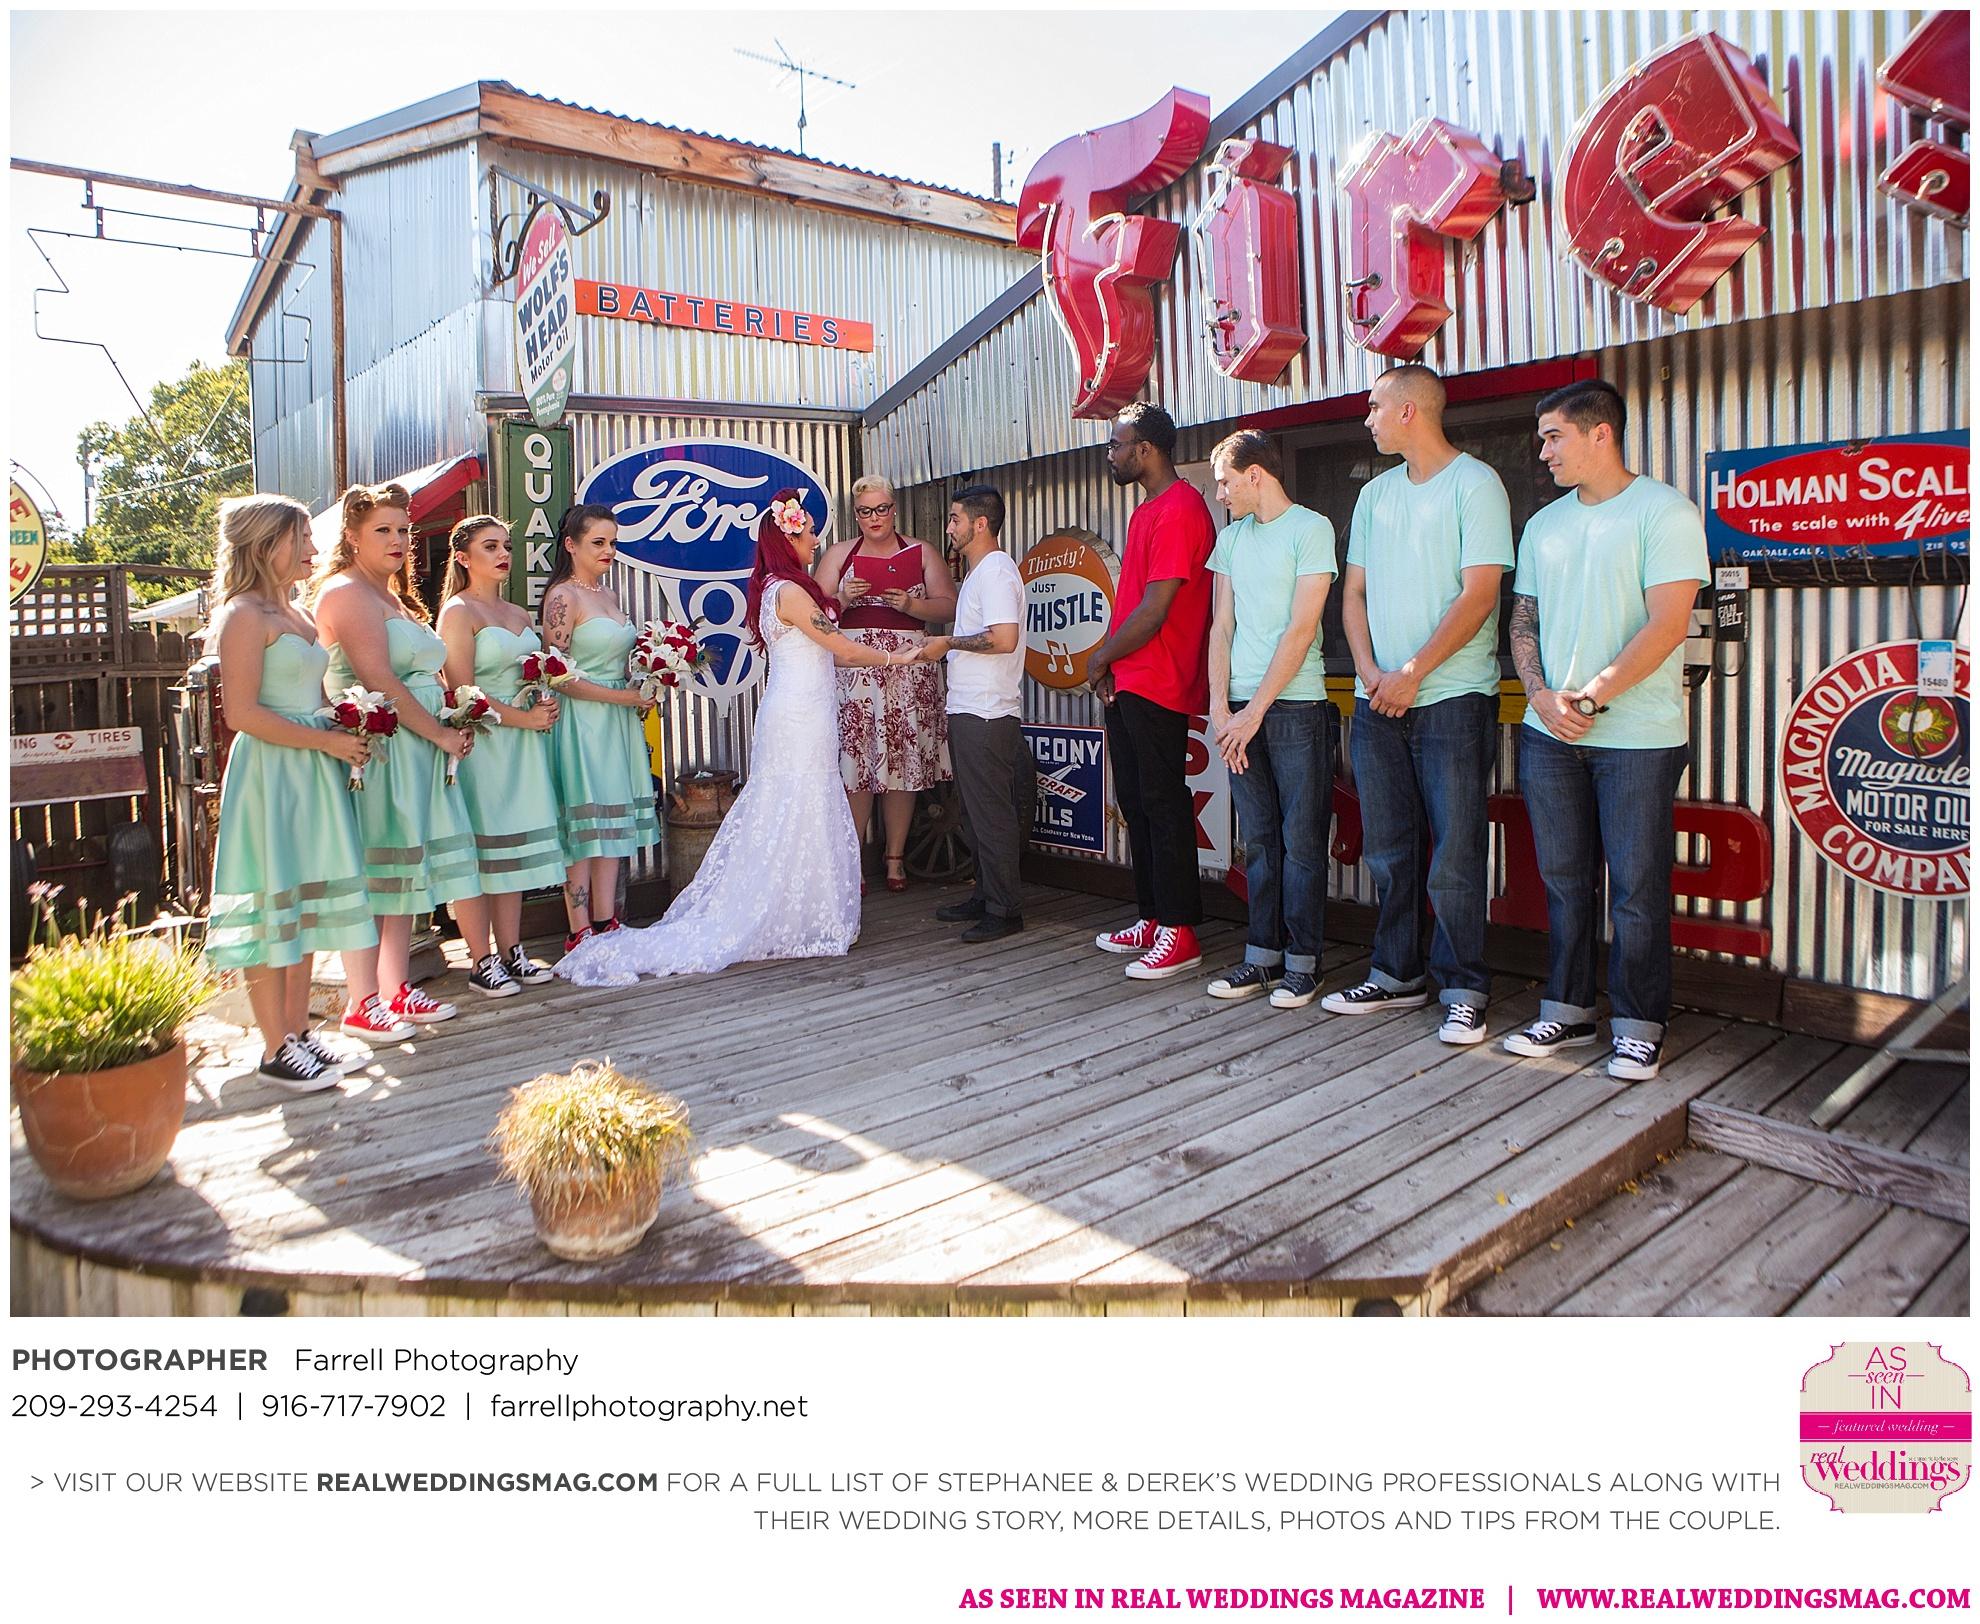 farrell-photography-stephanee-derek-real-weddings-sacramento-wedding-photographer-_0036